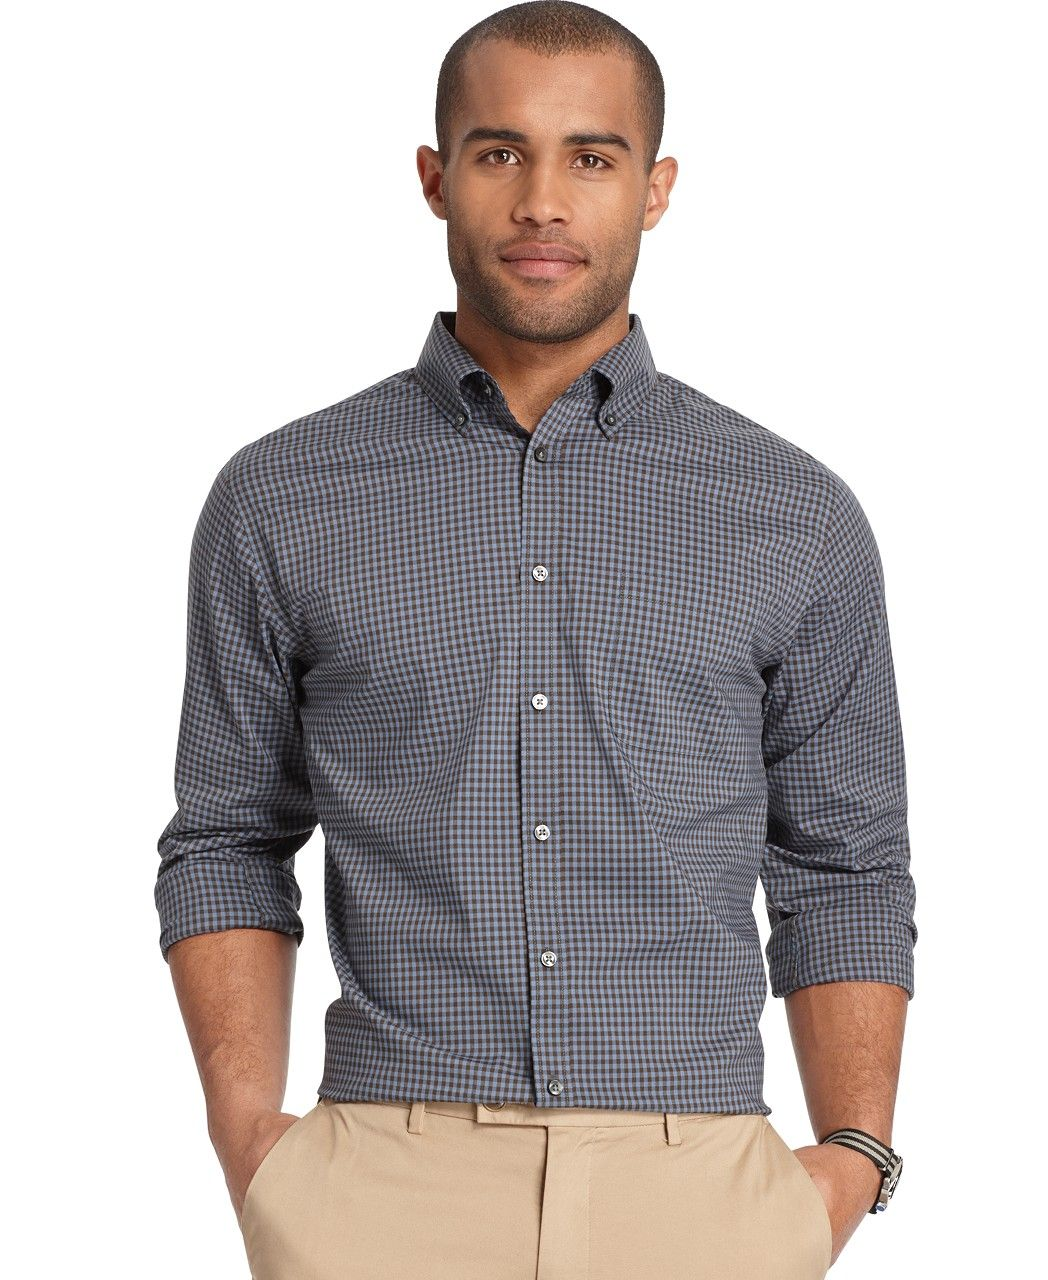 Black, Check Casual ButtonDown Shirts Macy's Mens